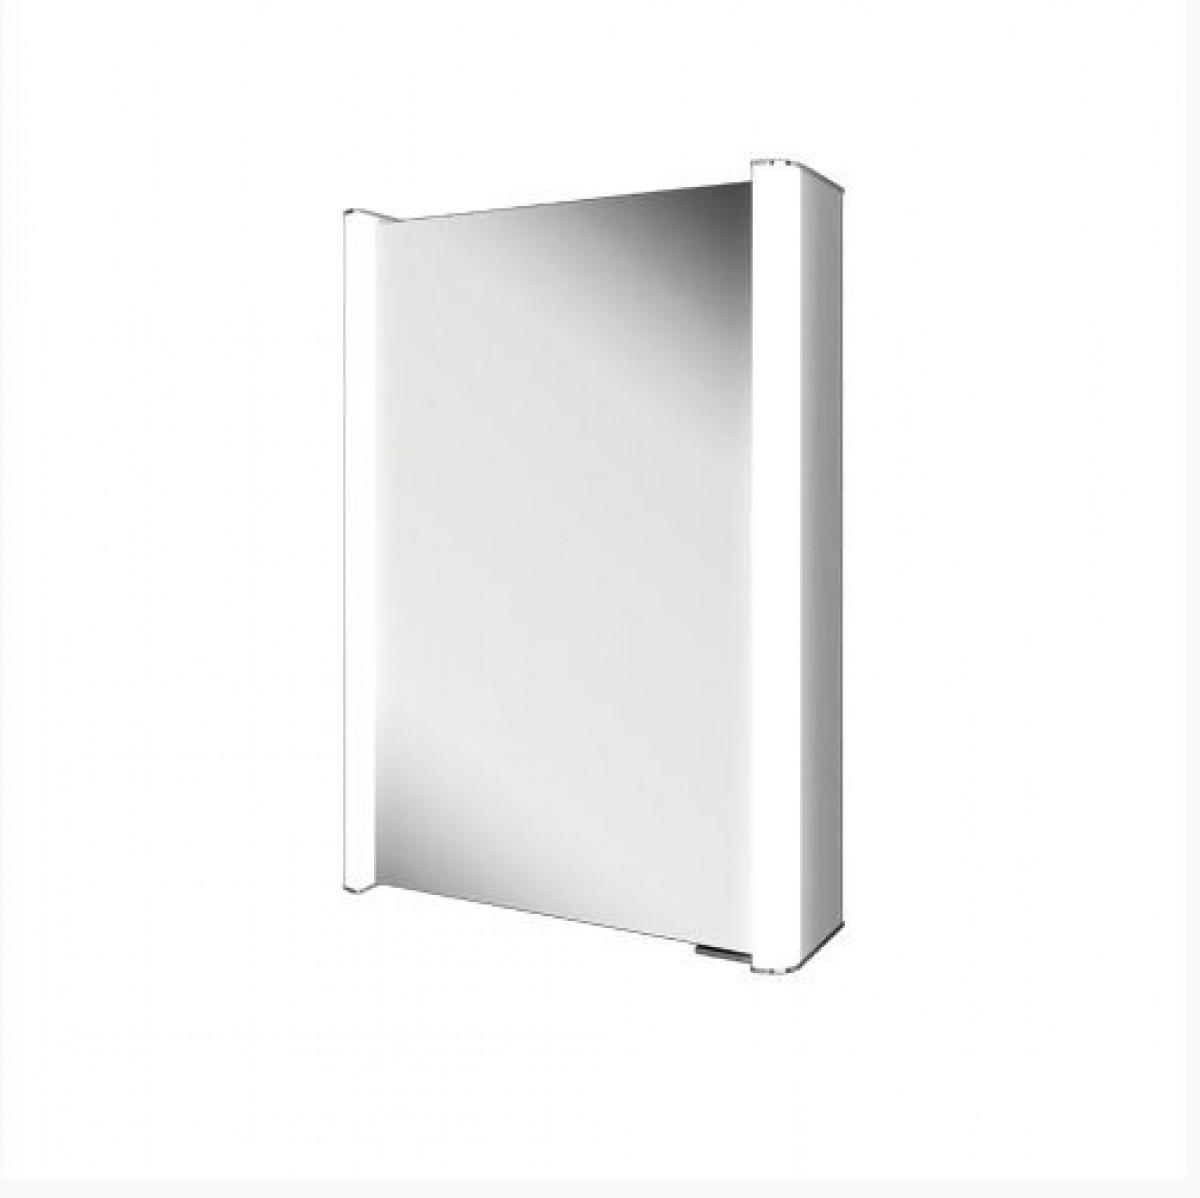 hib aluminium cabinets hib vita 50 aluminium led bathroom cabinet